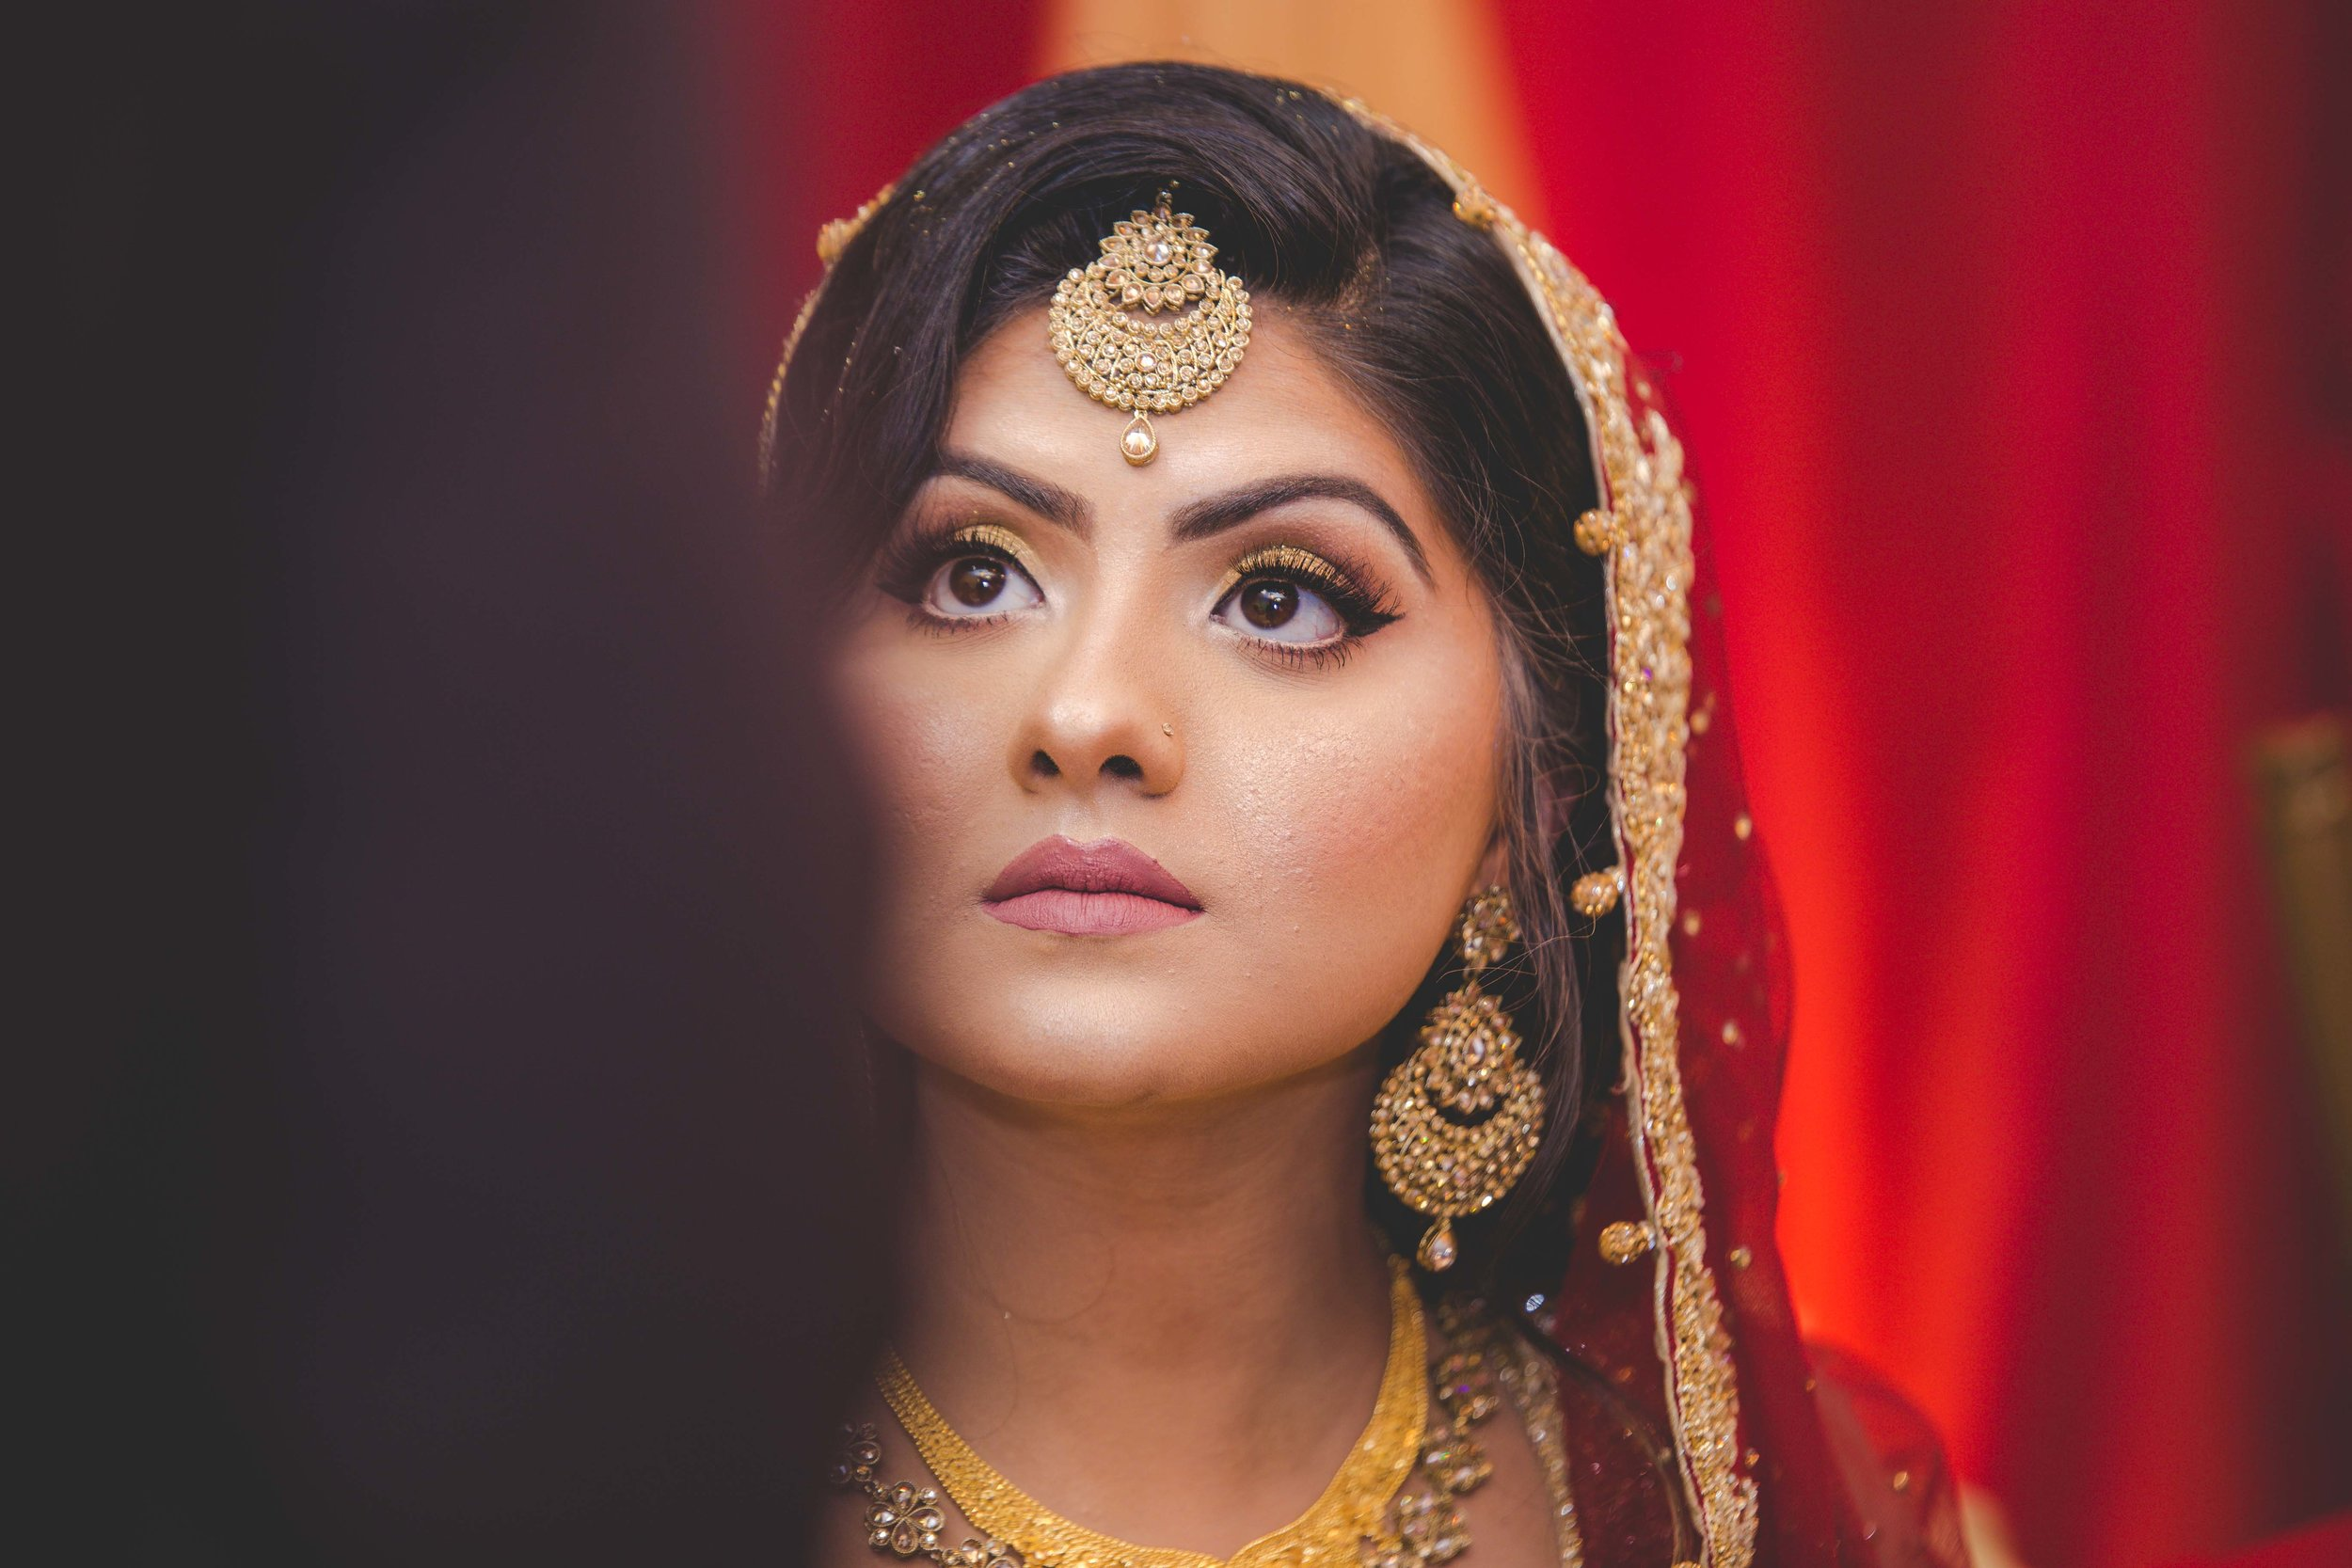 pakistani-wedding-photographer-brooklyn-new-york-22.jpg